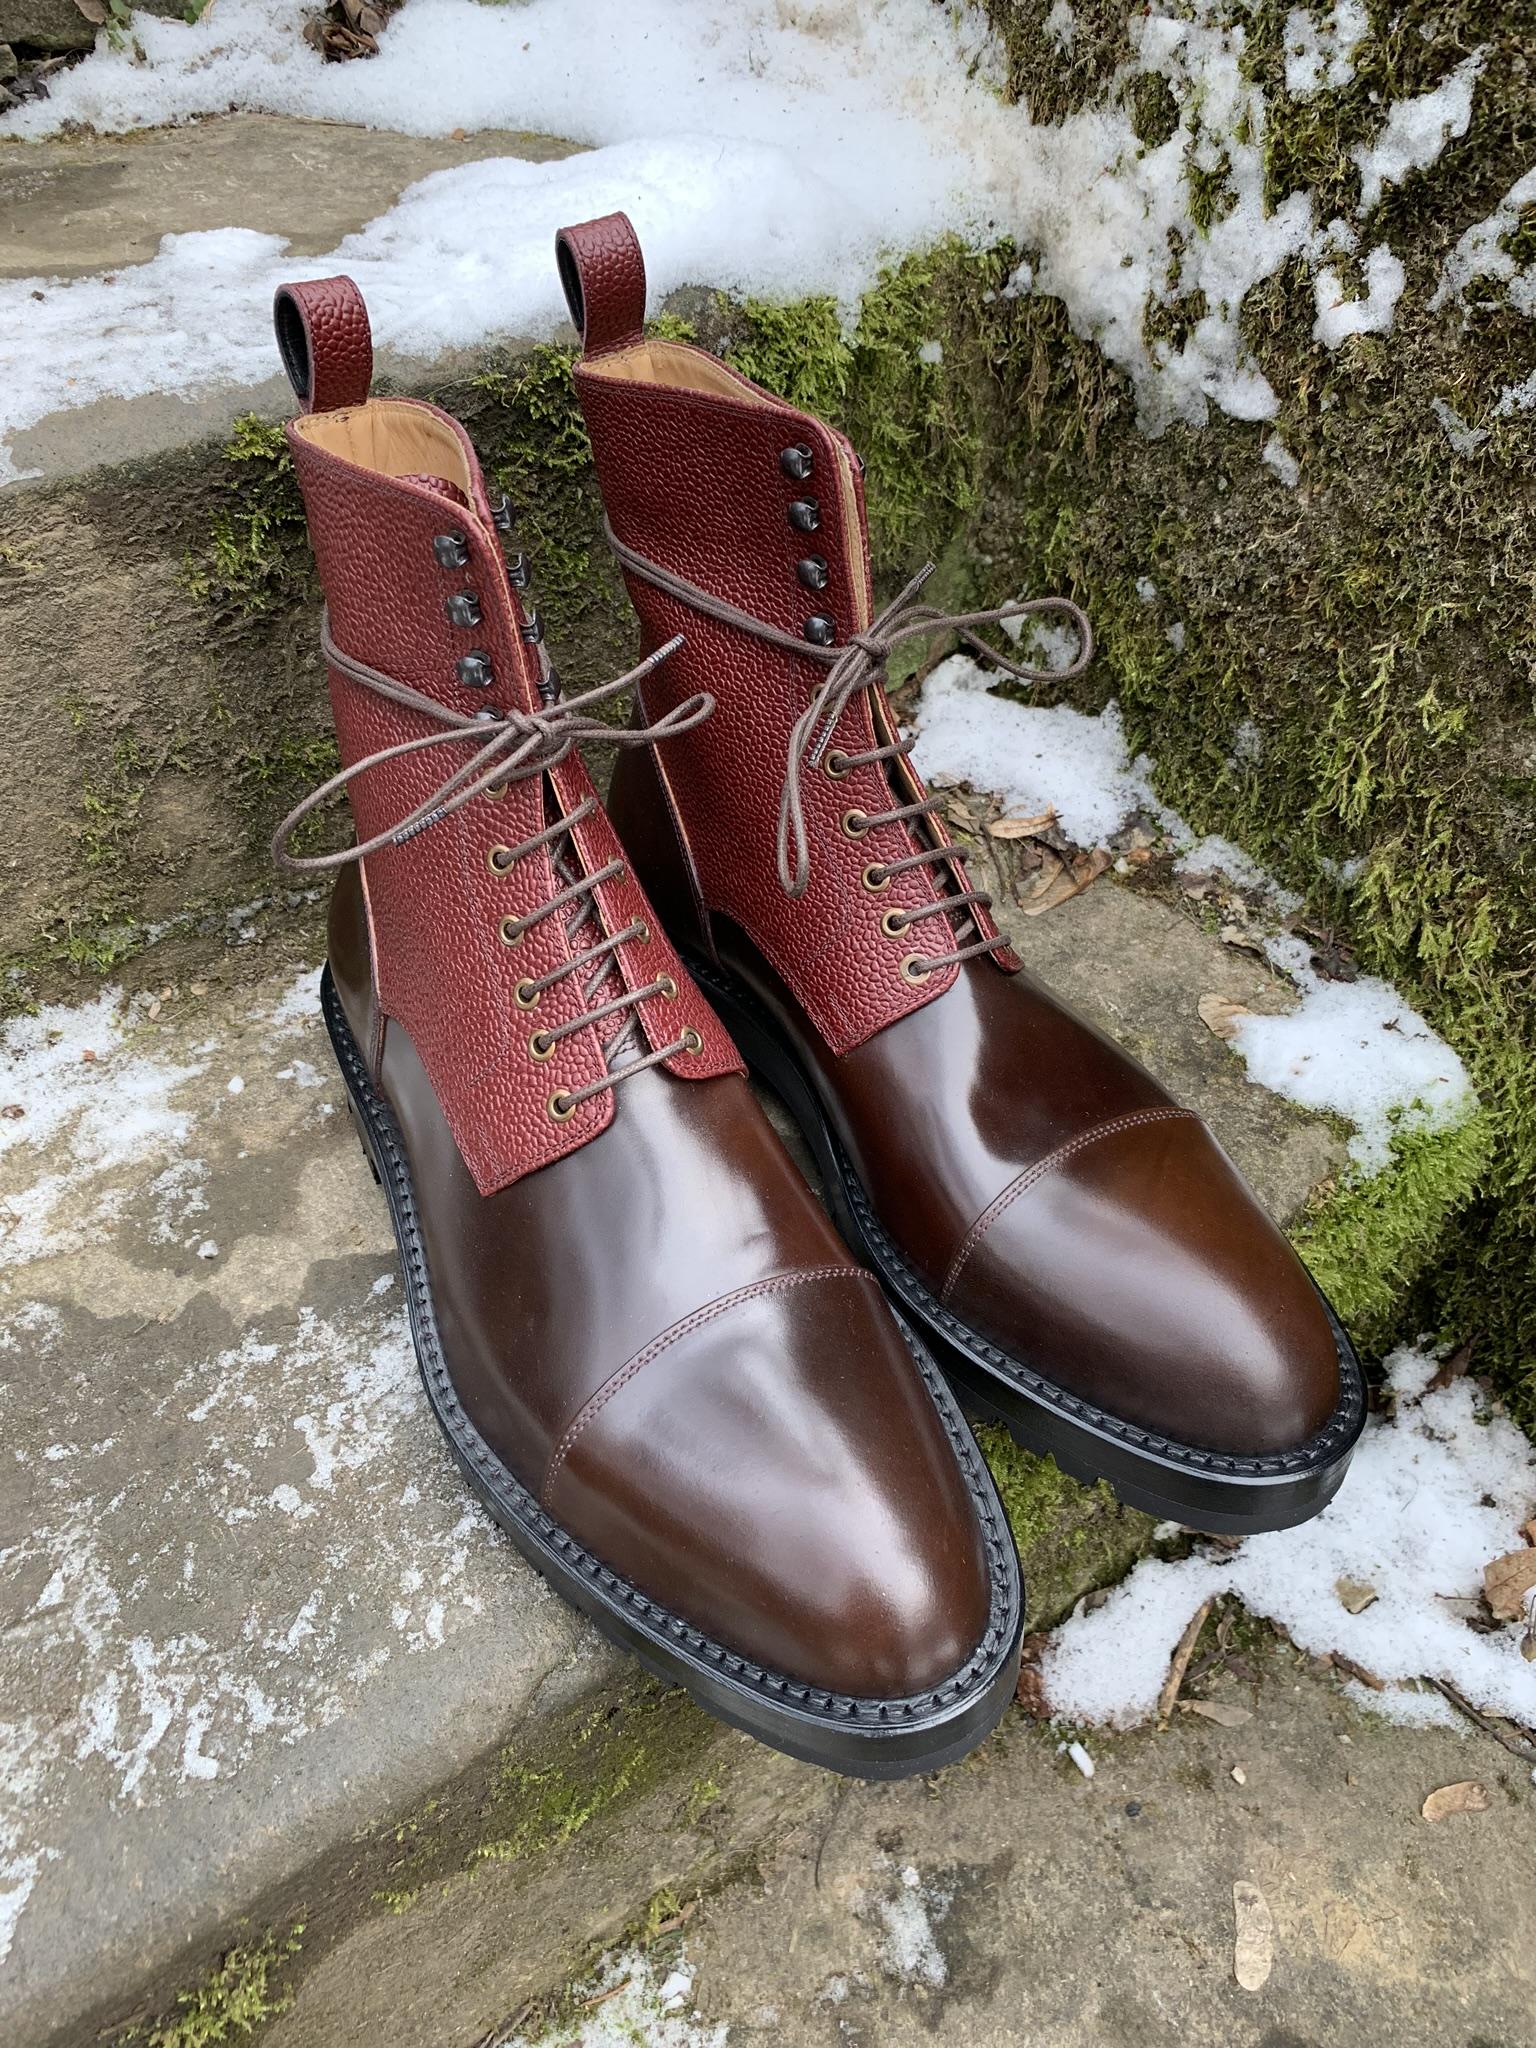 Leather-Boots-London-Shell-Scotch-Gal9